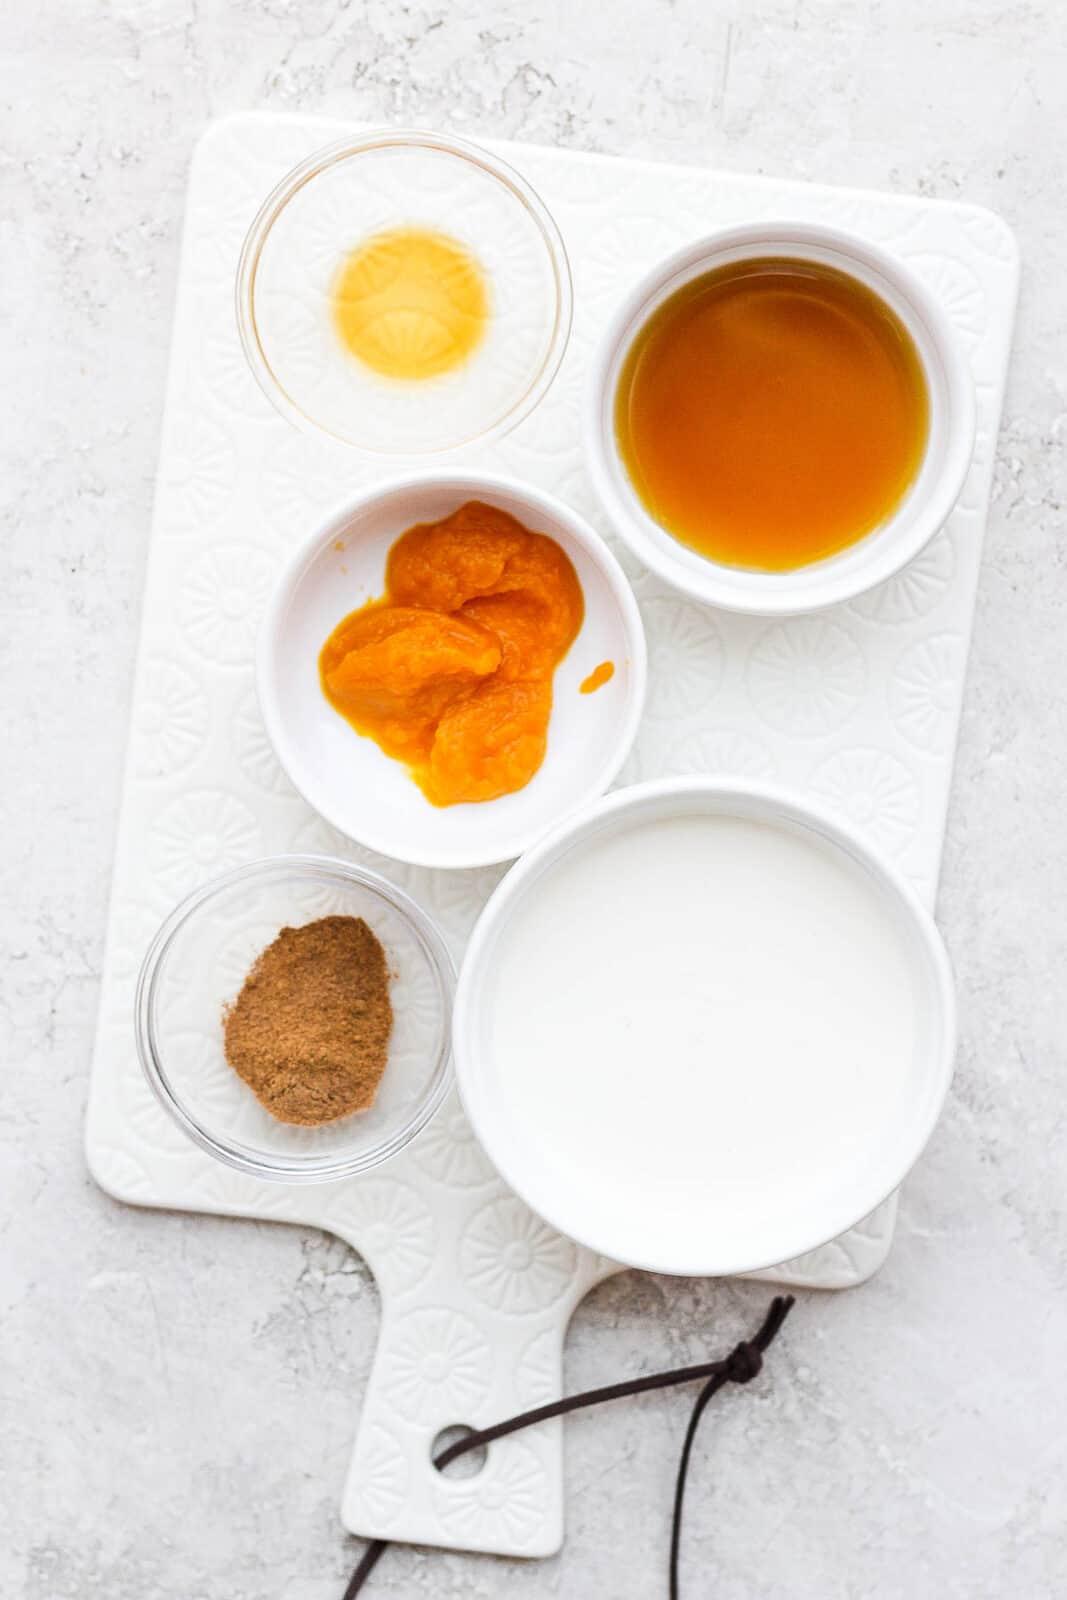 Ingredients in individual bowls.